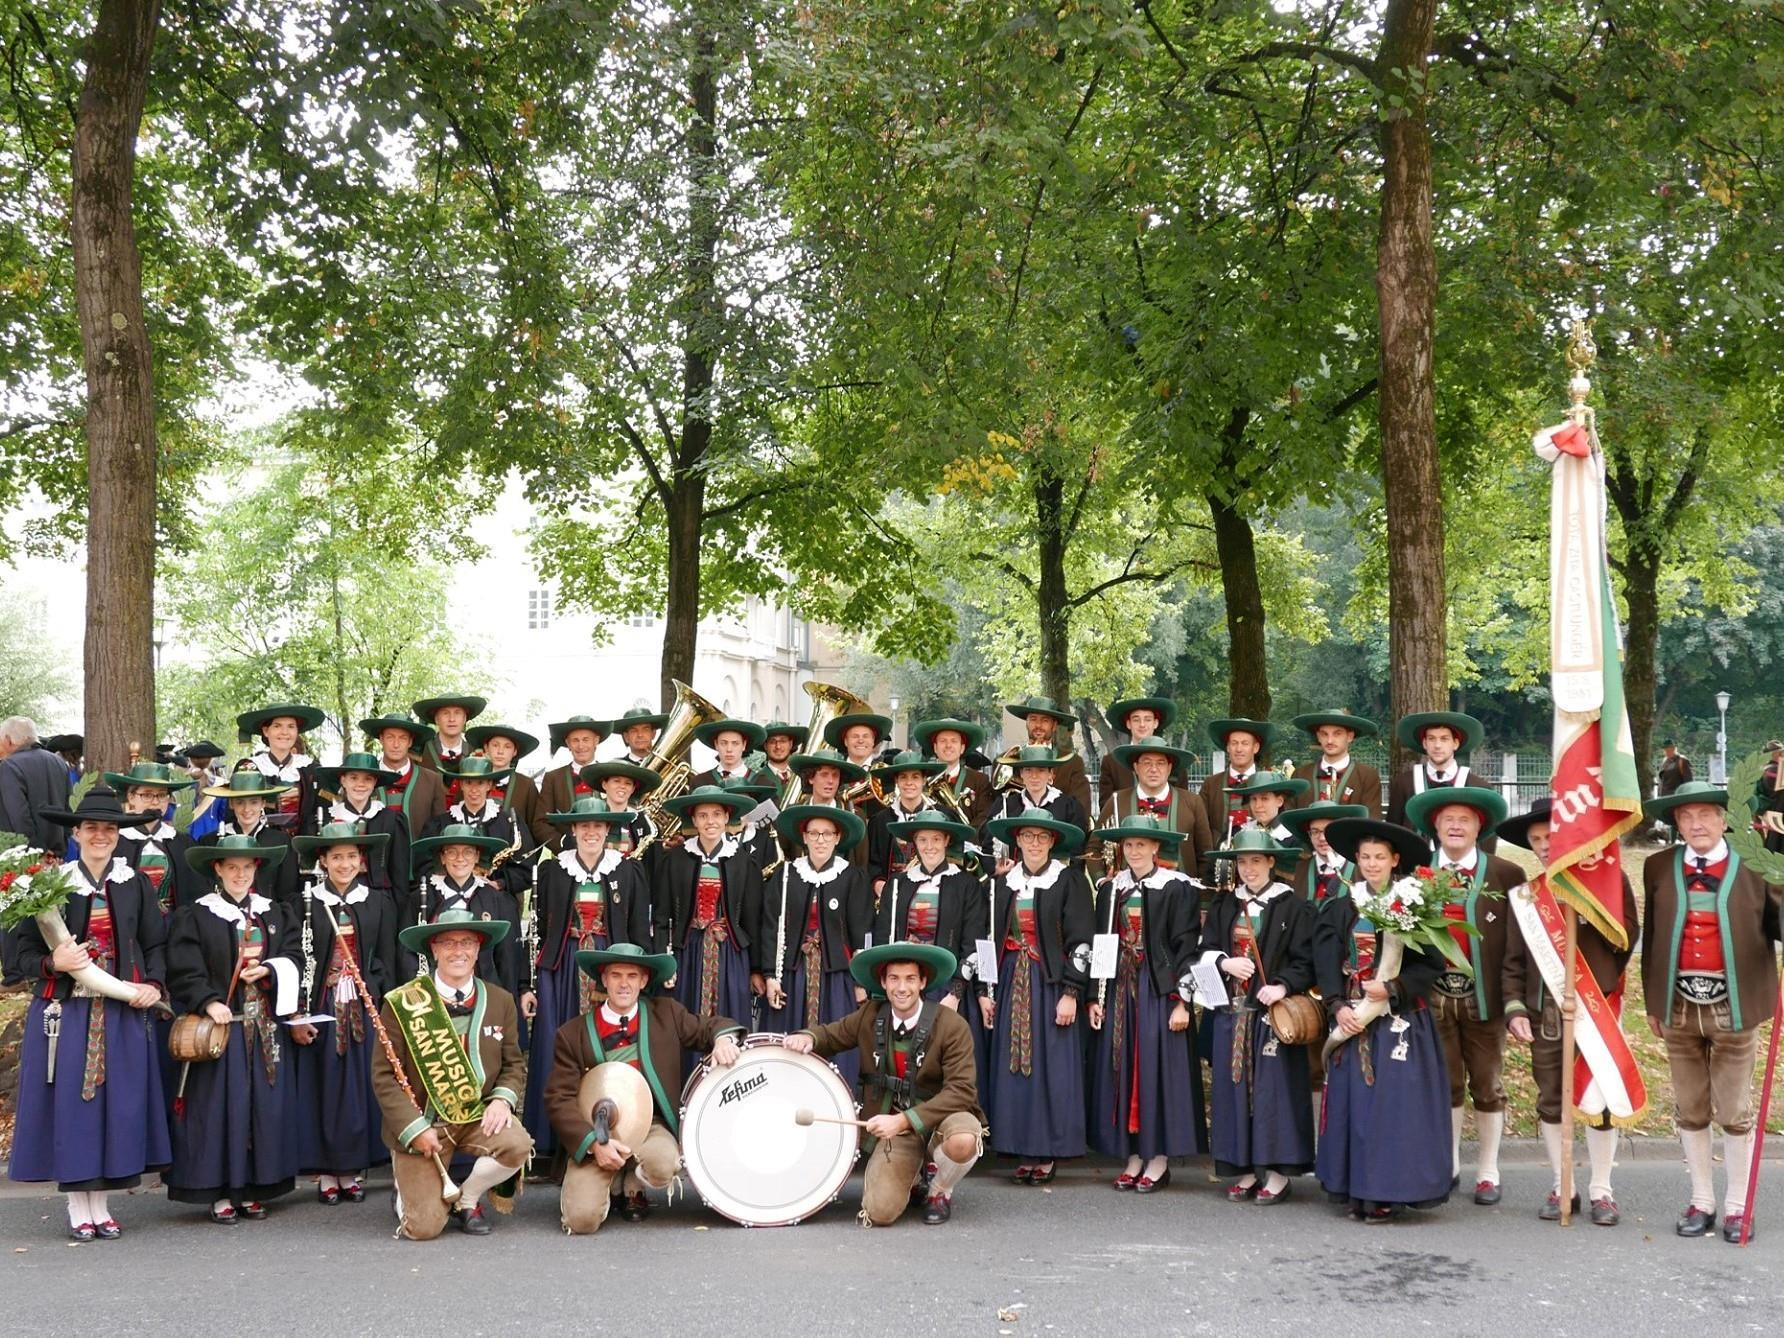 Concerto della banda musicale San Martin de Tor